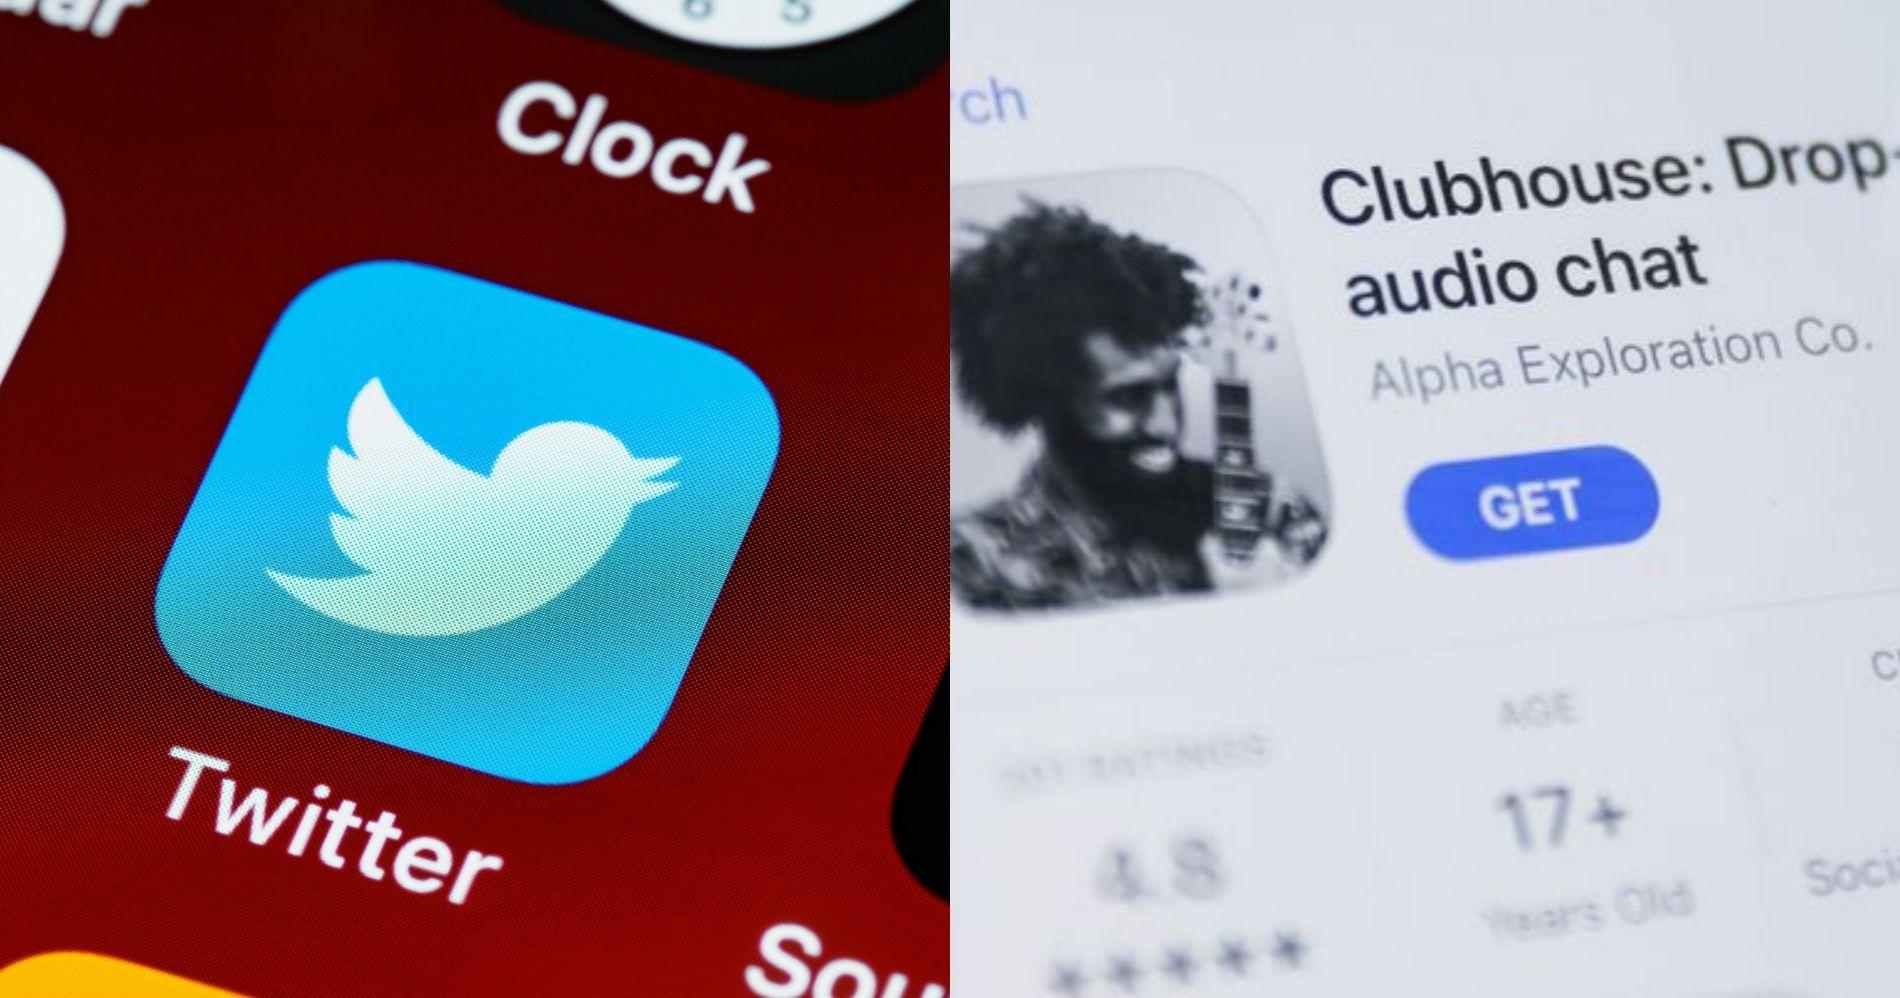 Twitter Diskusi Ambil Alih Clubhouse - Canva